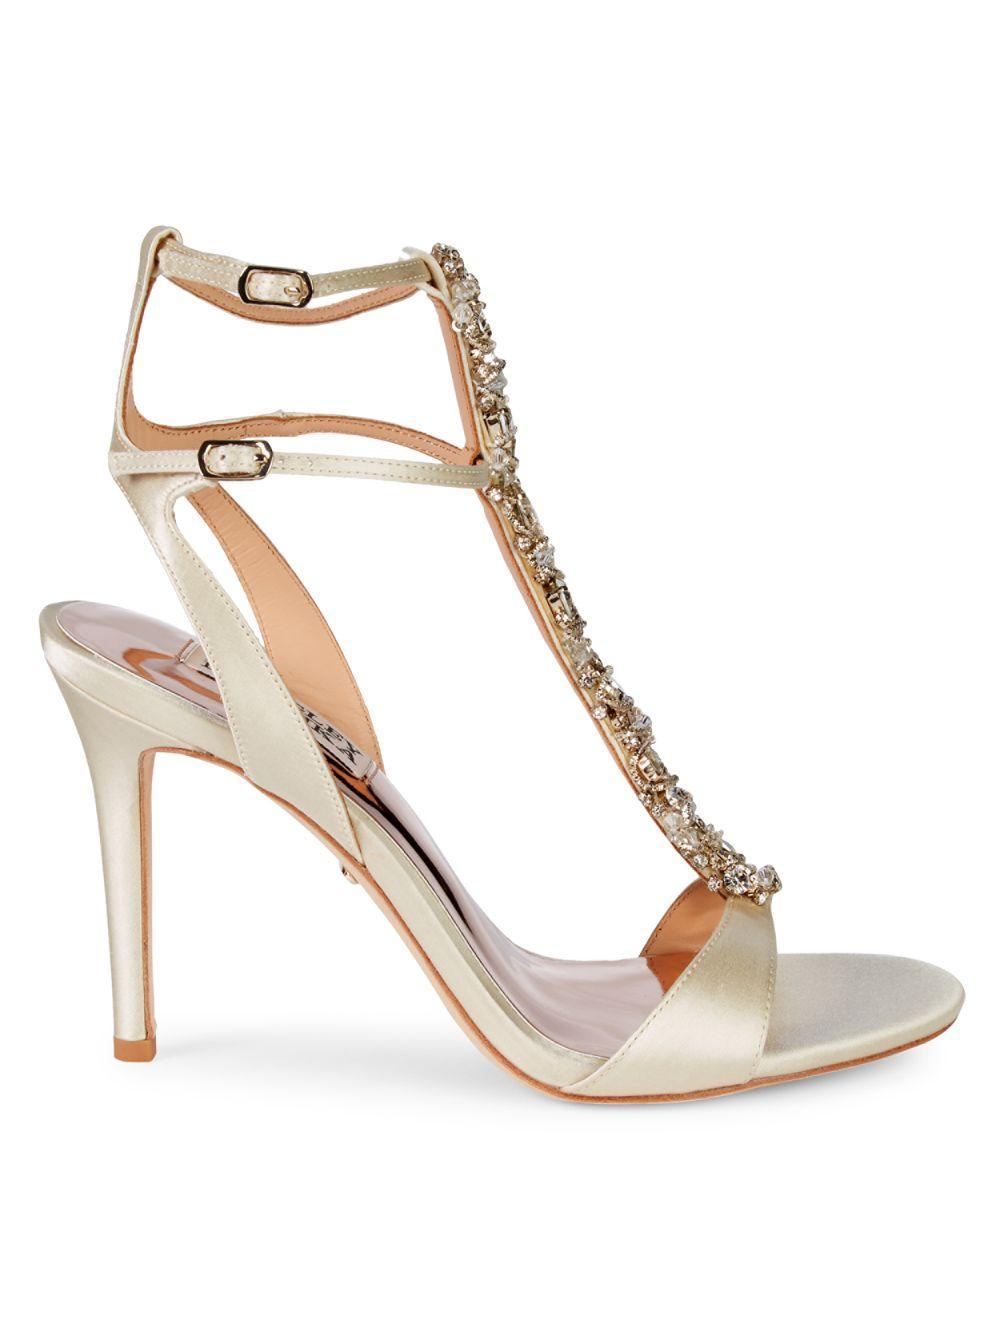 4f3c3be4acb9 Badgley Mischka. Women s White Hollow Embellished Metallic High-heel Sandals